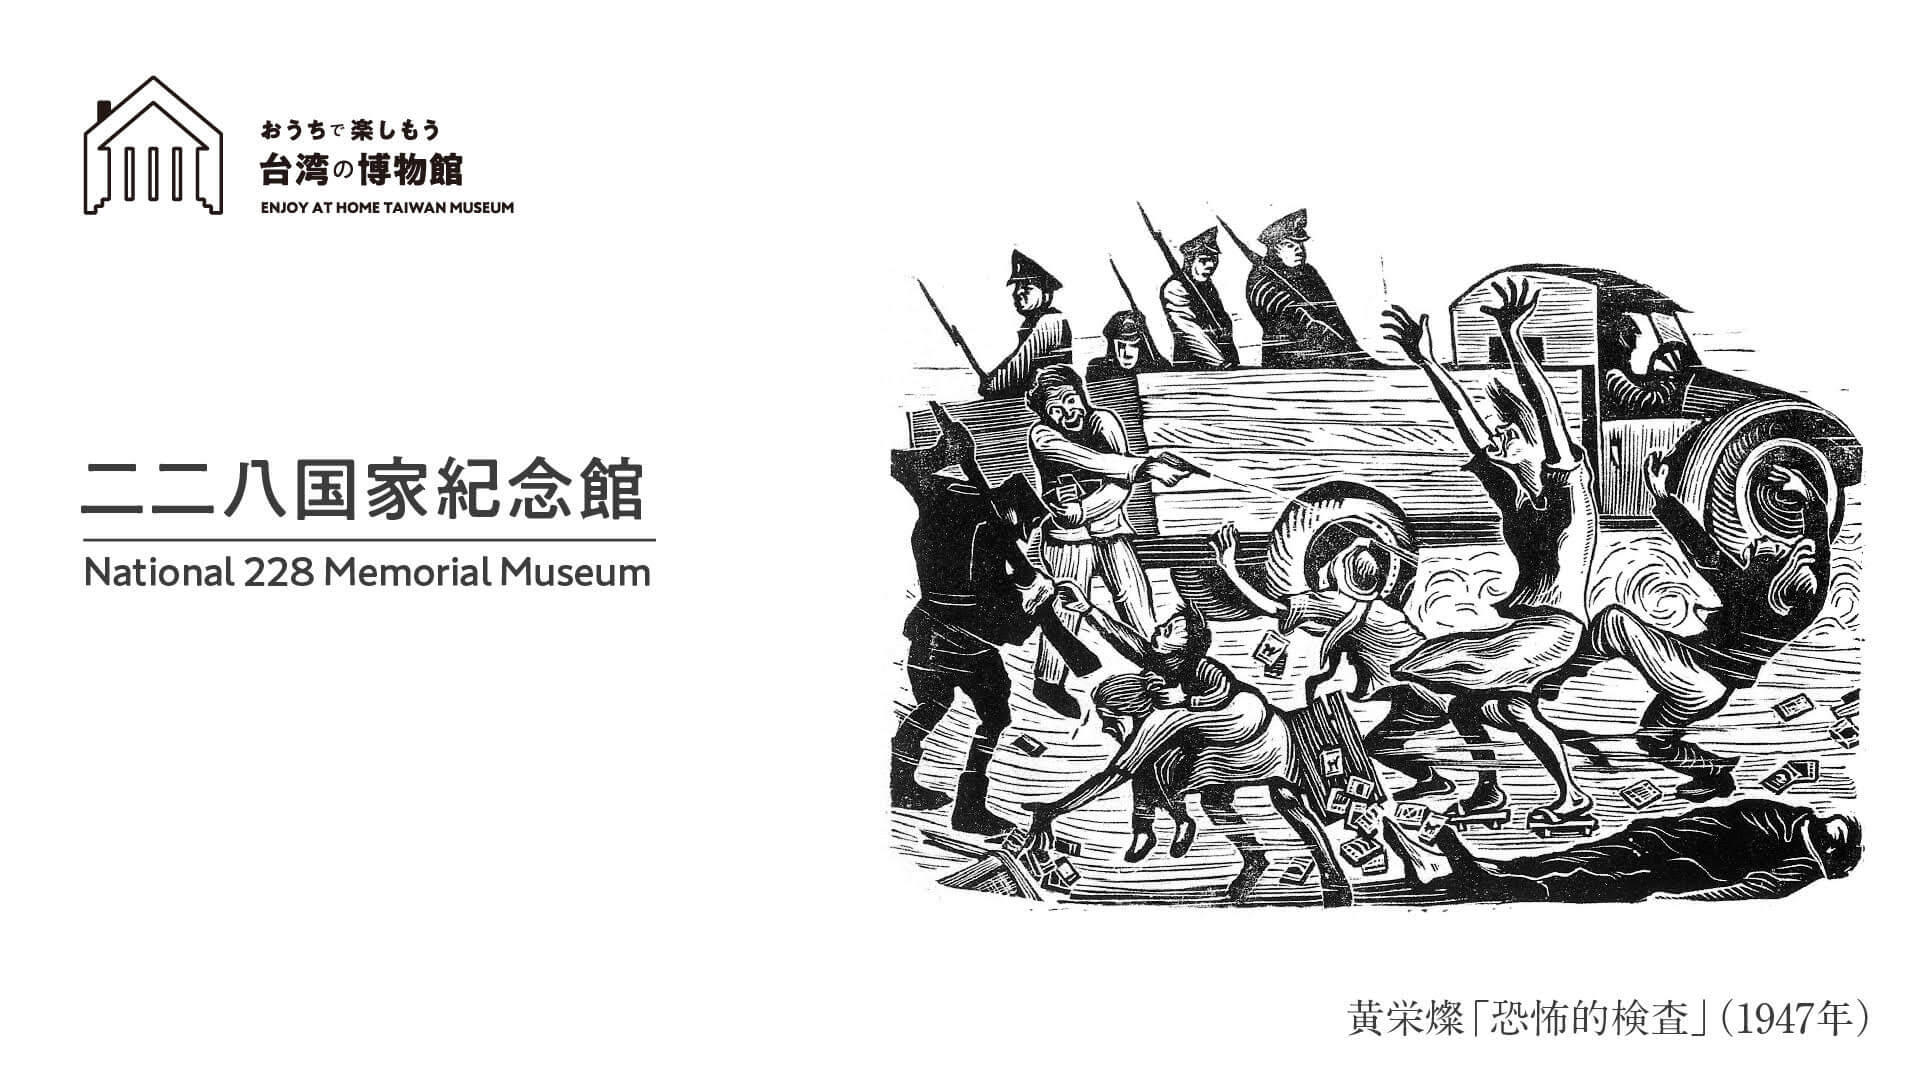 SNET台湾チャンネル『おうちで楽しもう台湾の博物館』第7回 二二八国家紀念館 配信